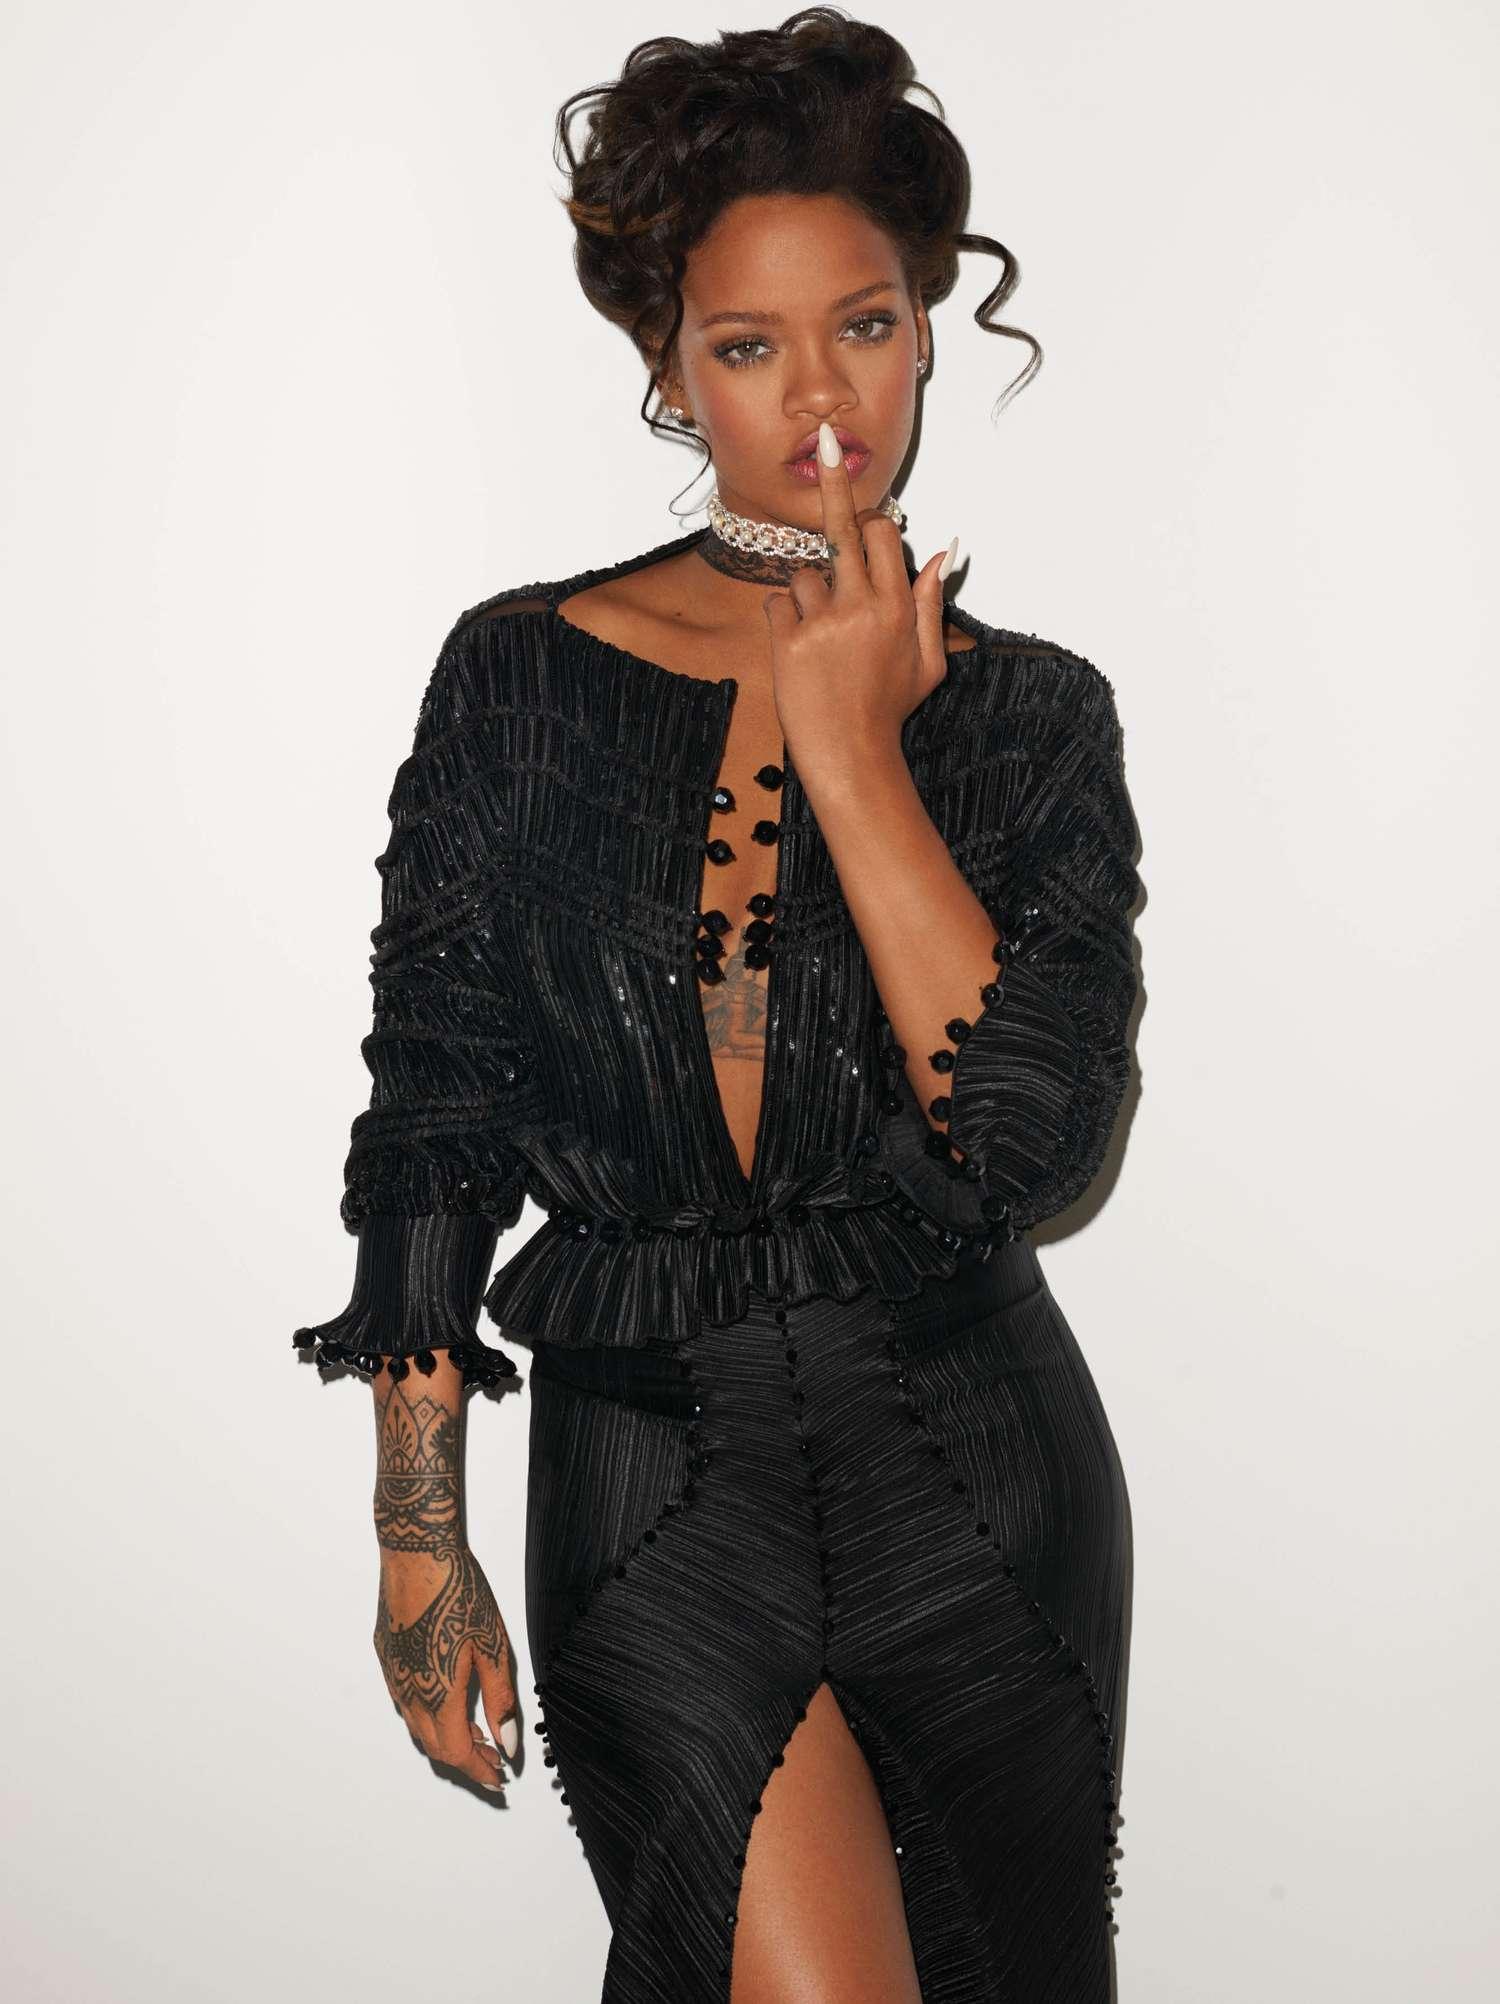 Fashion fall 2017 - Rihanna Terry Richardson Photoshoot For Cr Fashion Book